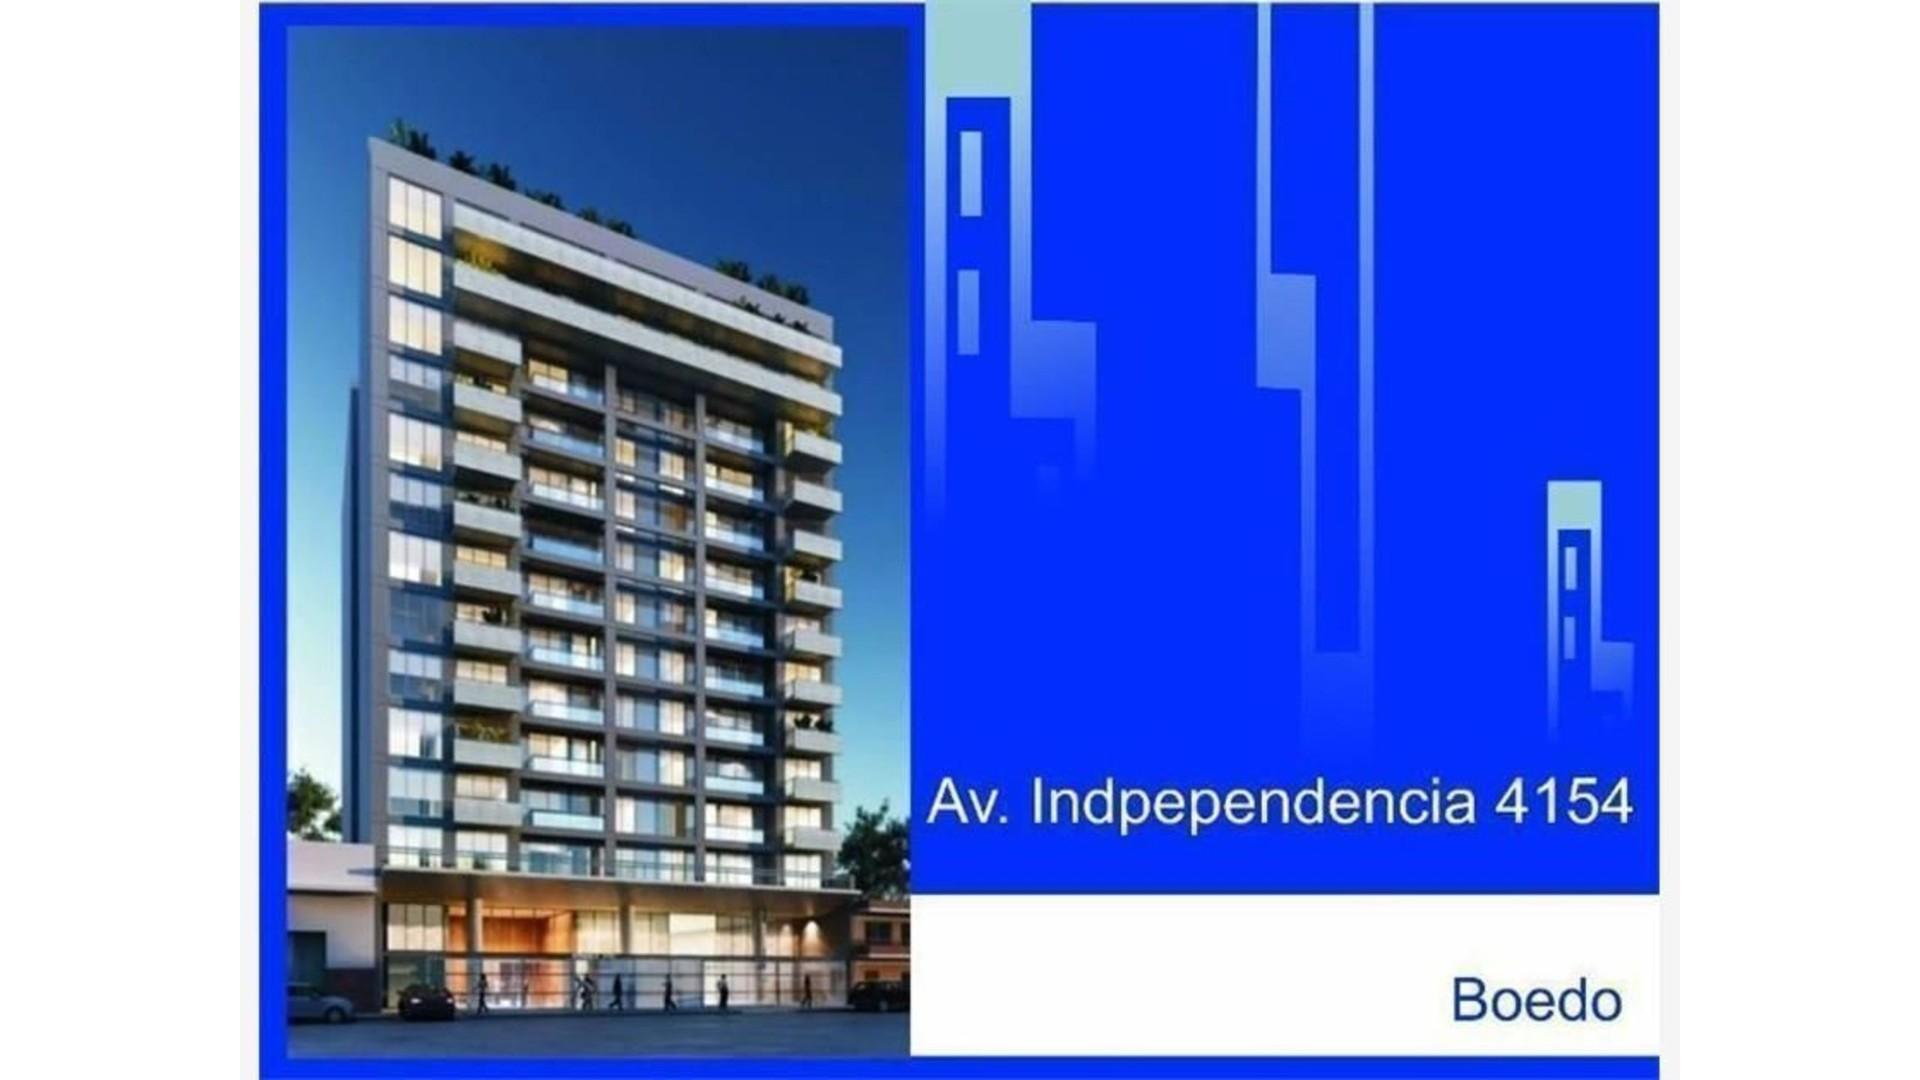 Av.Independencia 4154 - Boedo